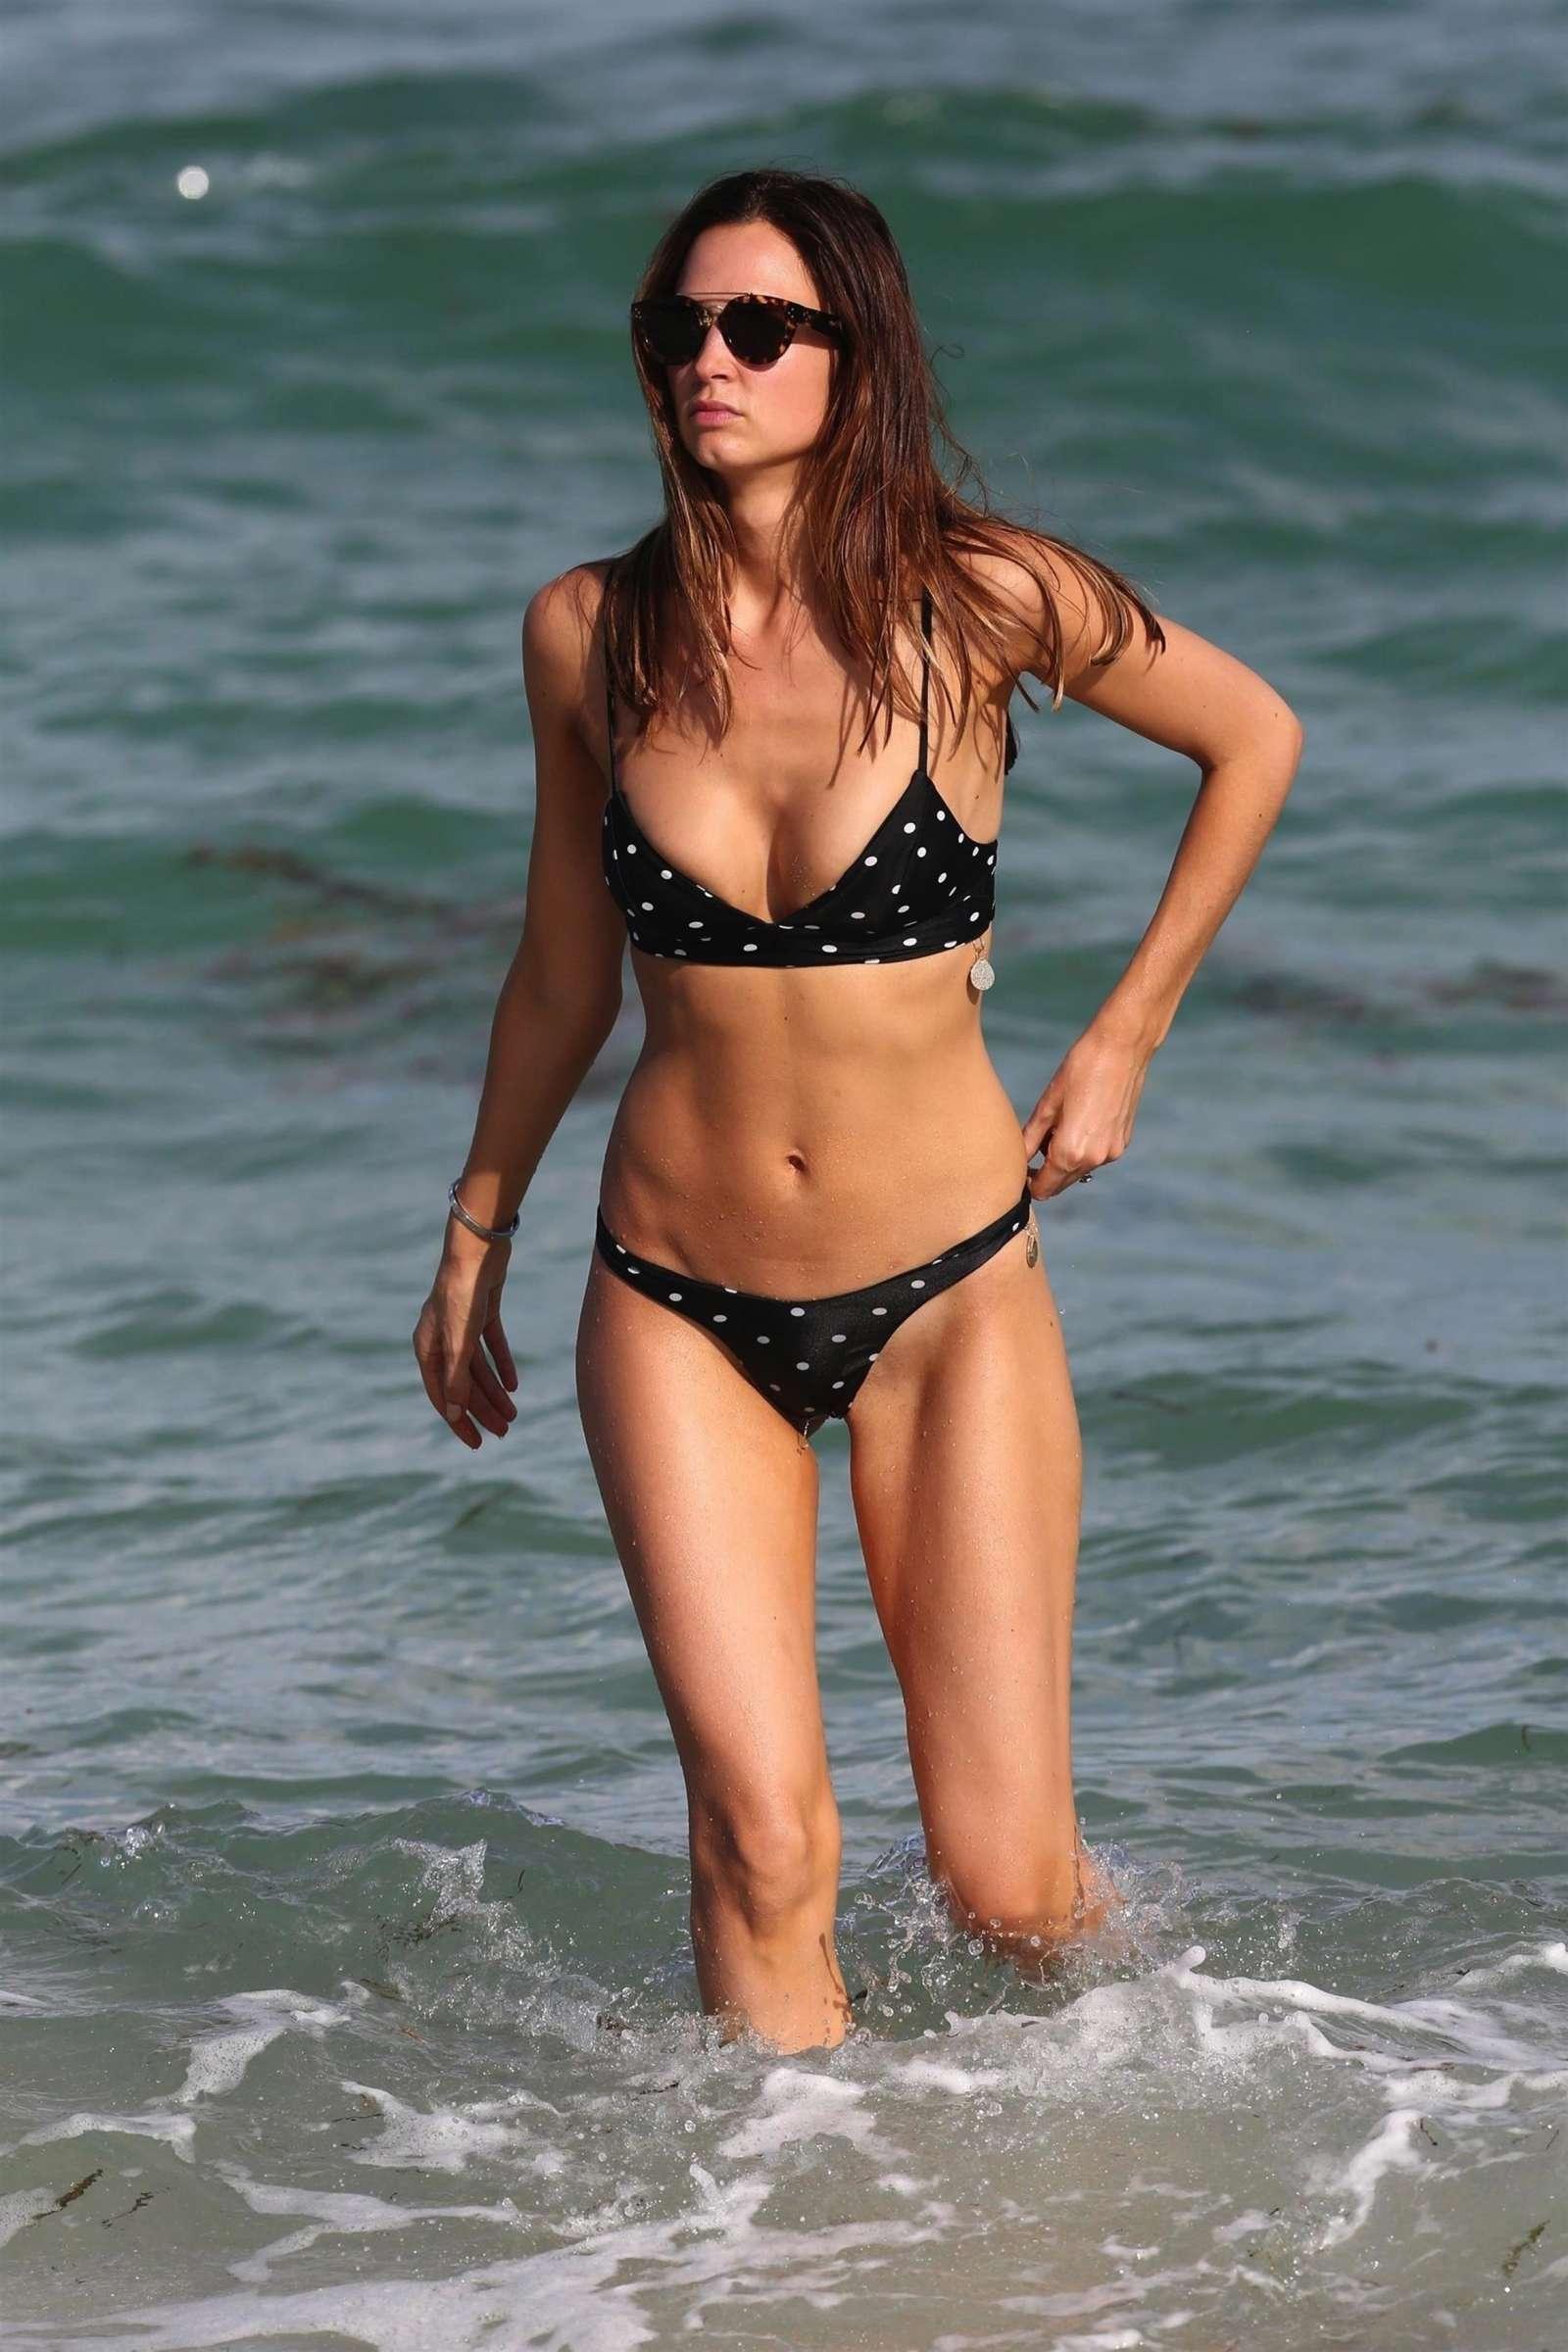 Alice Amelie in Bikini on the beach in Miami Pic 1 of 35